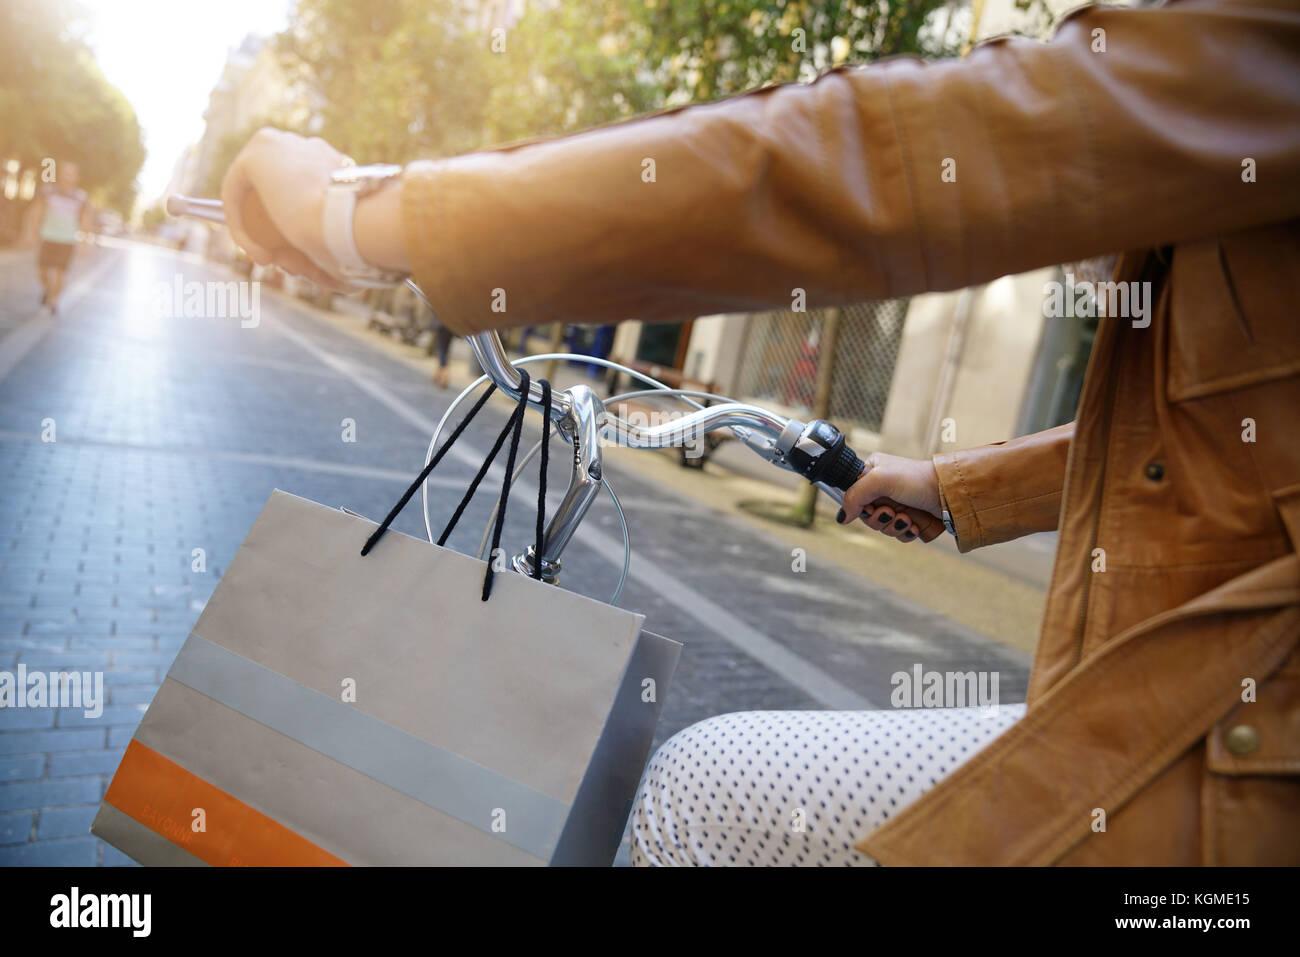 Closeup of woman riding bike in town - Stock Image